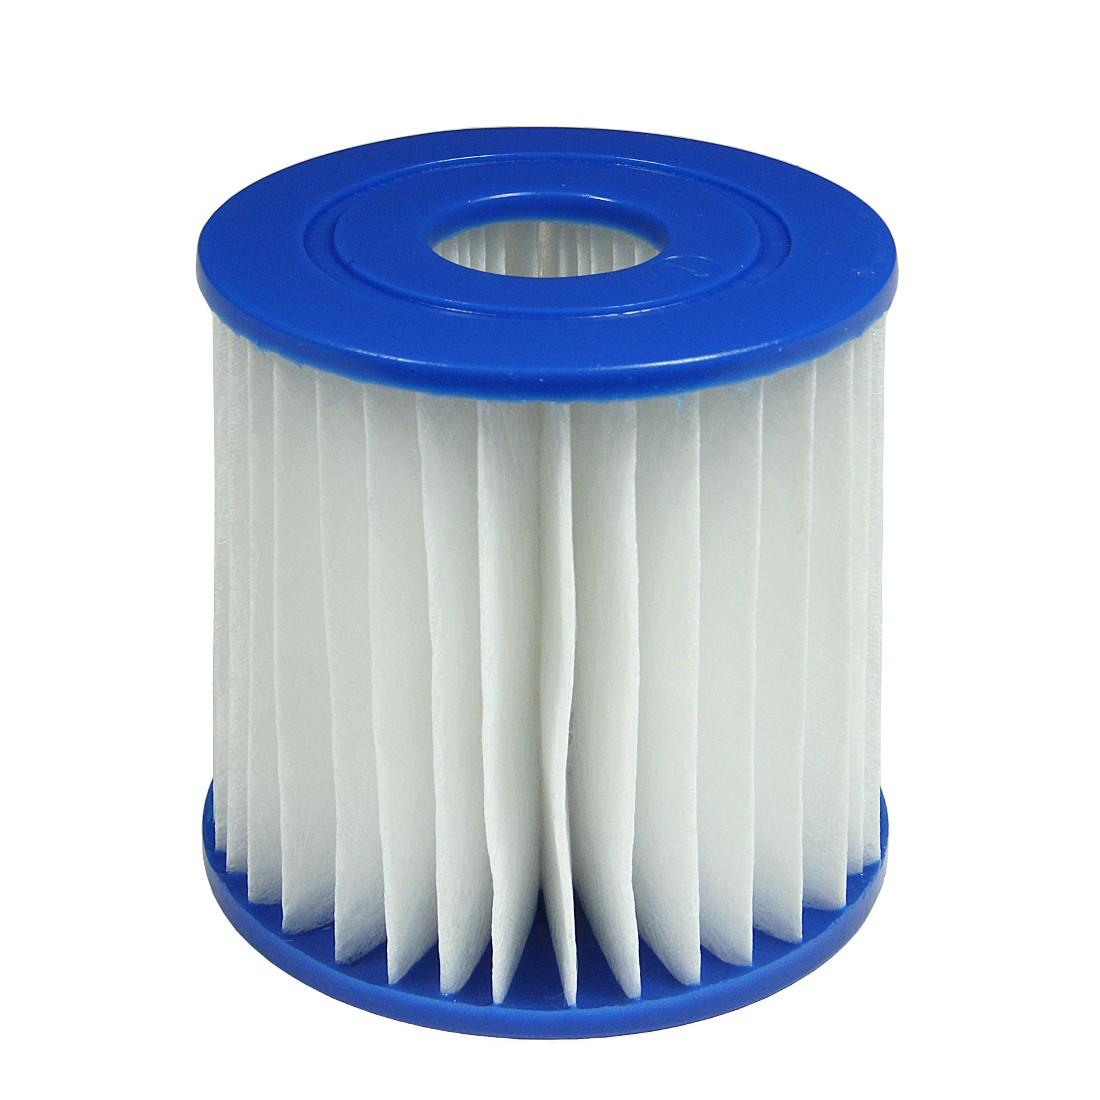 Achetez jilong filter cartridge no 1 cartouche filtrante for Cartouche filtrante pour piscine